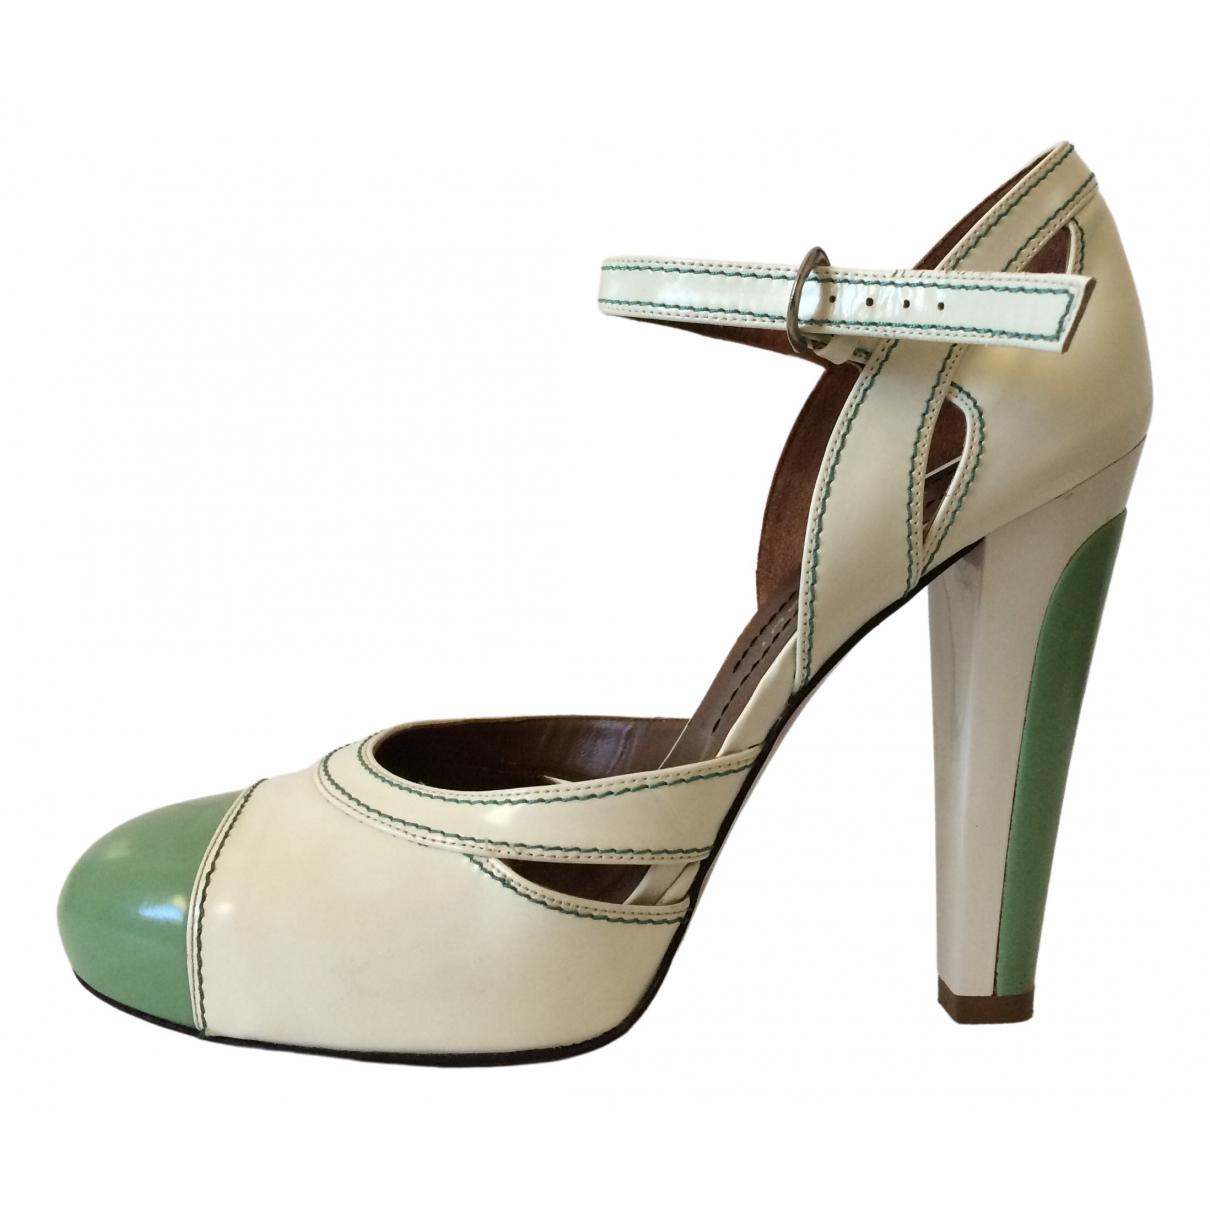 Barbara Bui \N White Patent leather Heels for Women 39.5 EU